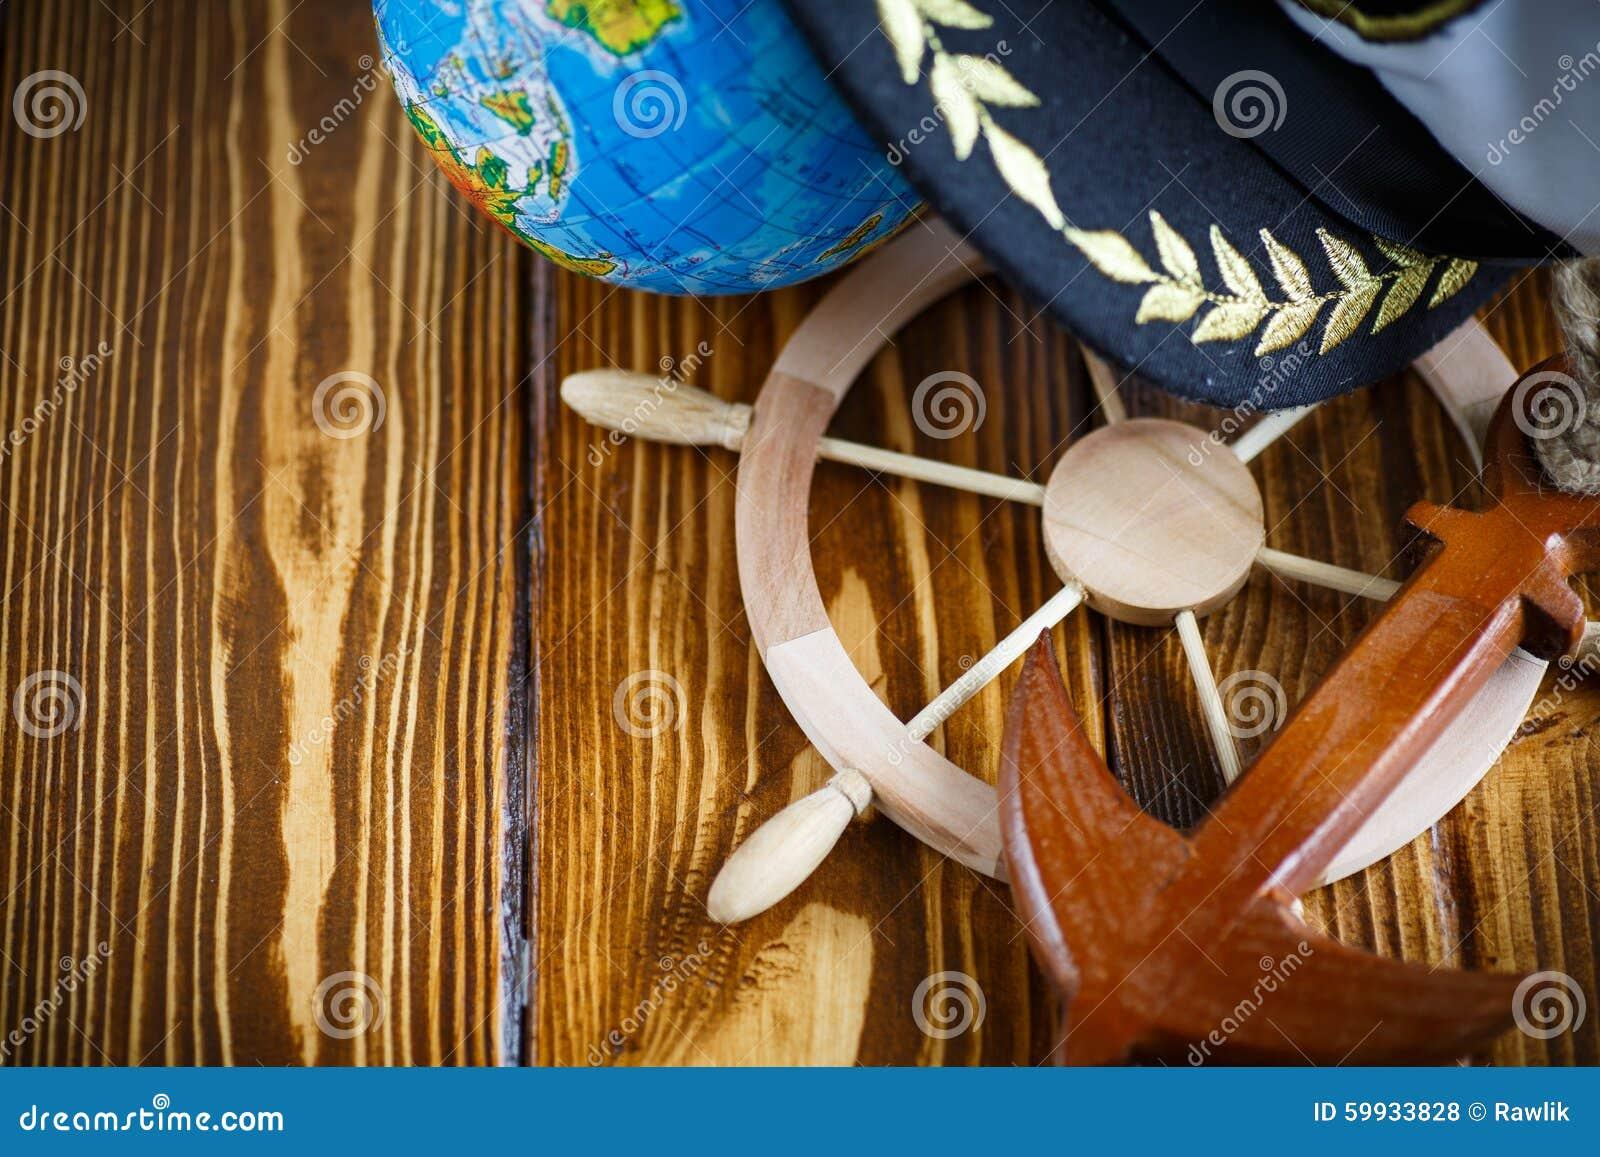 Decorative Wooden Steering Wheel Stock Photo Image Of Rudder Boat 59933828